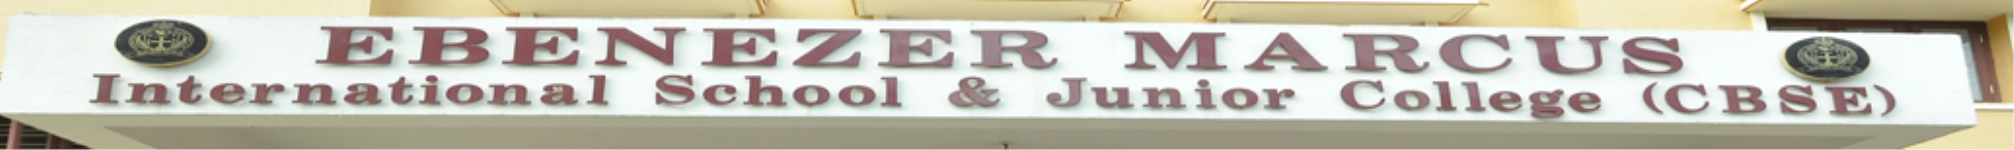 Ebenezer Marcus International School And Junior College - Ambattur - Chennai